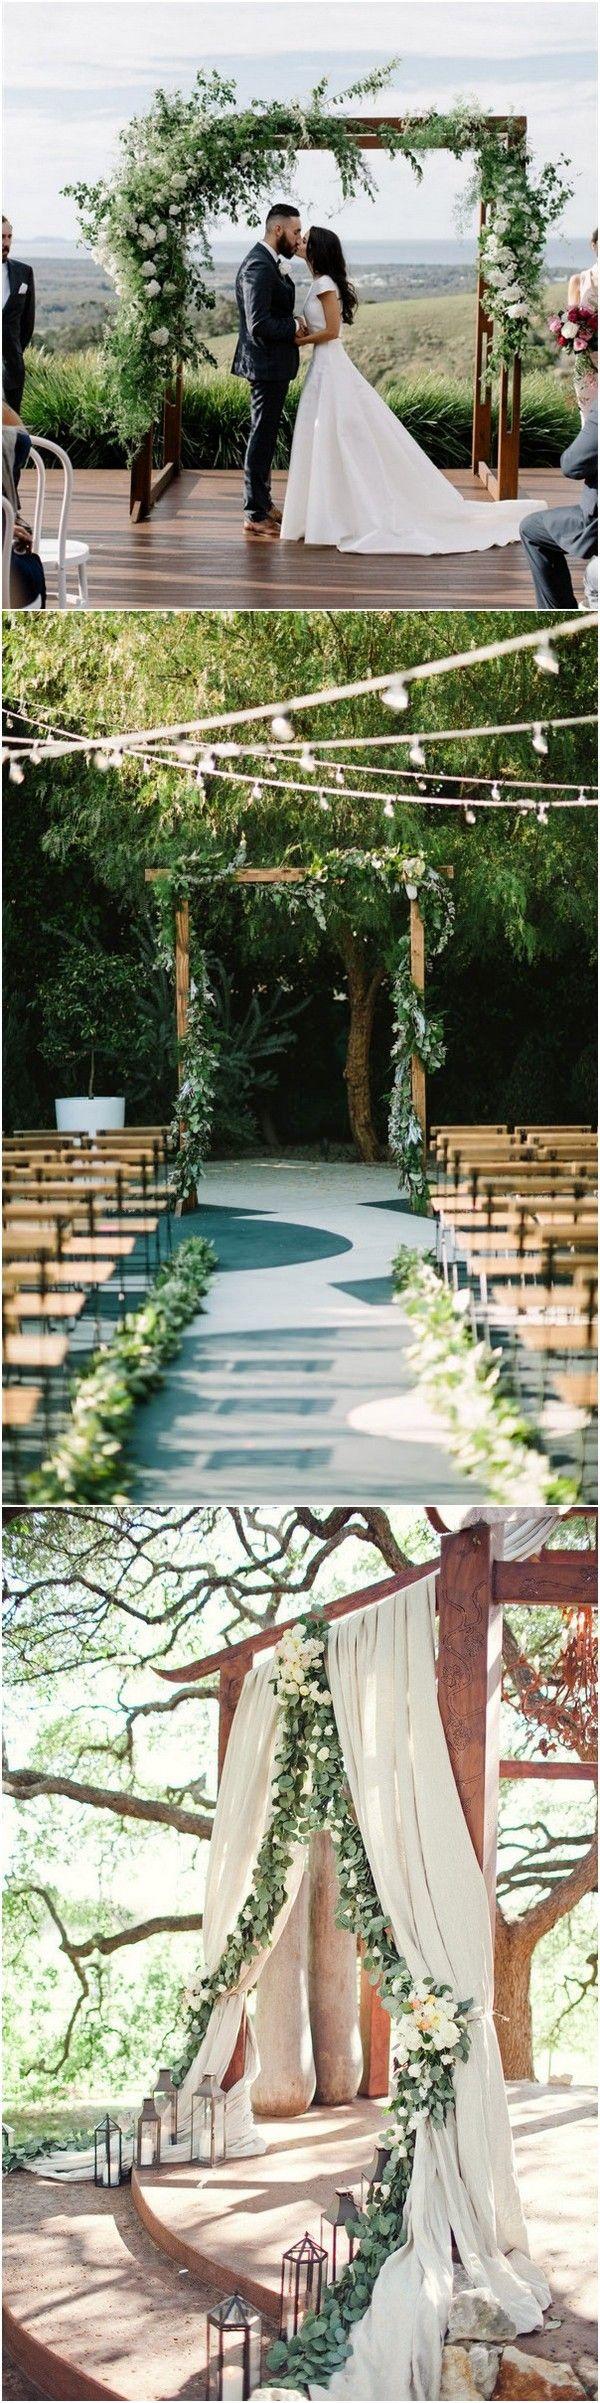 Greenery wedding alter decoration ideas #wedding #weddingideas #weddingdecorations #weddingarches